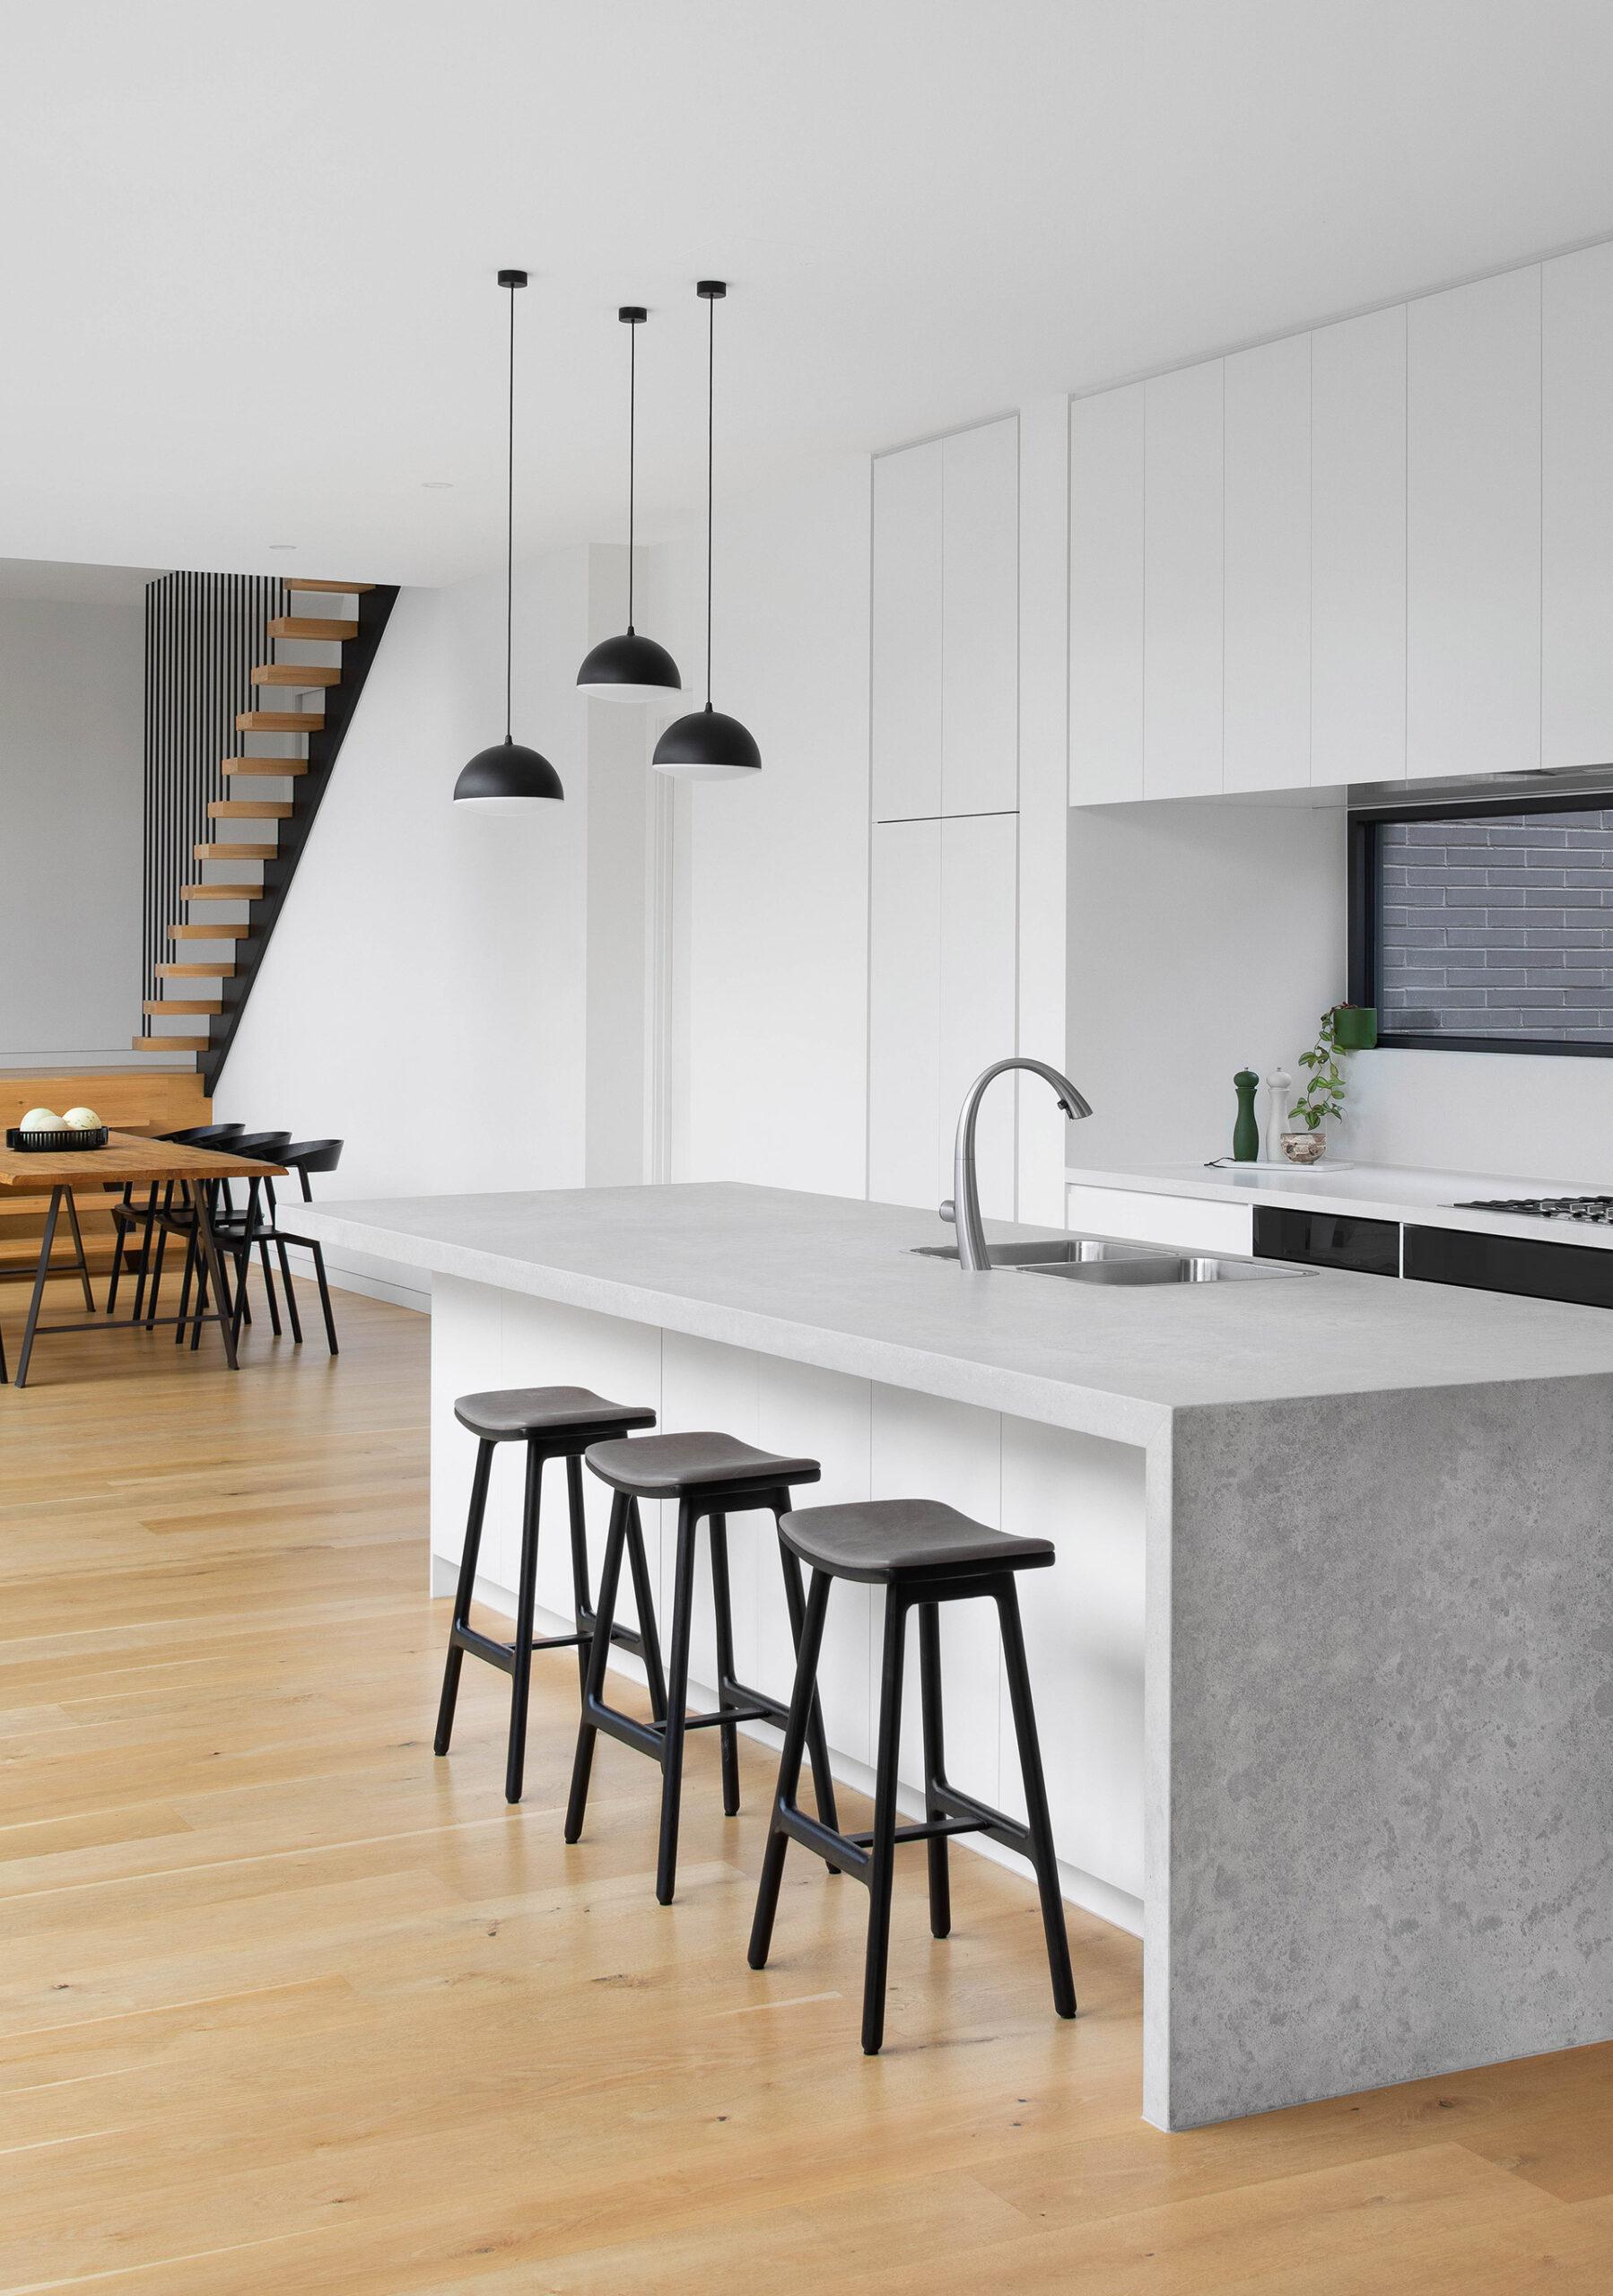 northcote-house-interior-design-kitchen-entryway-portrait-ckairouz-architects